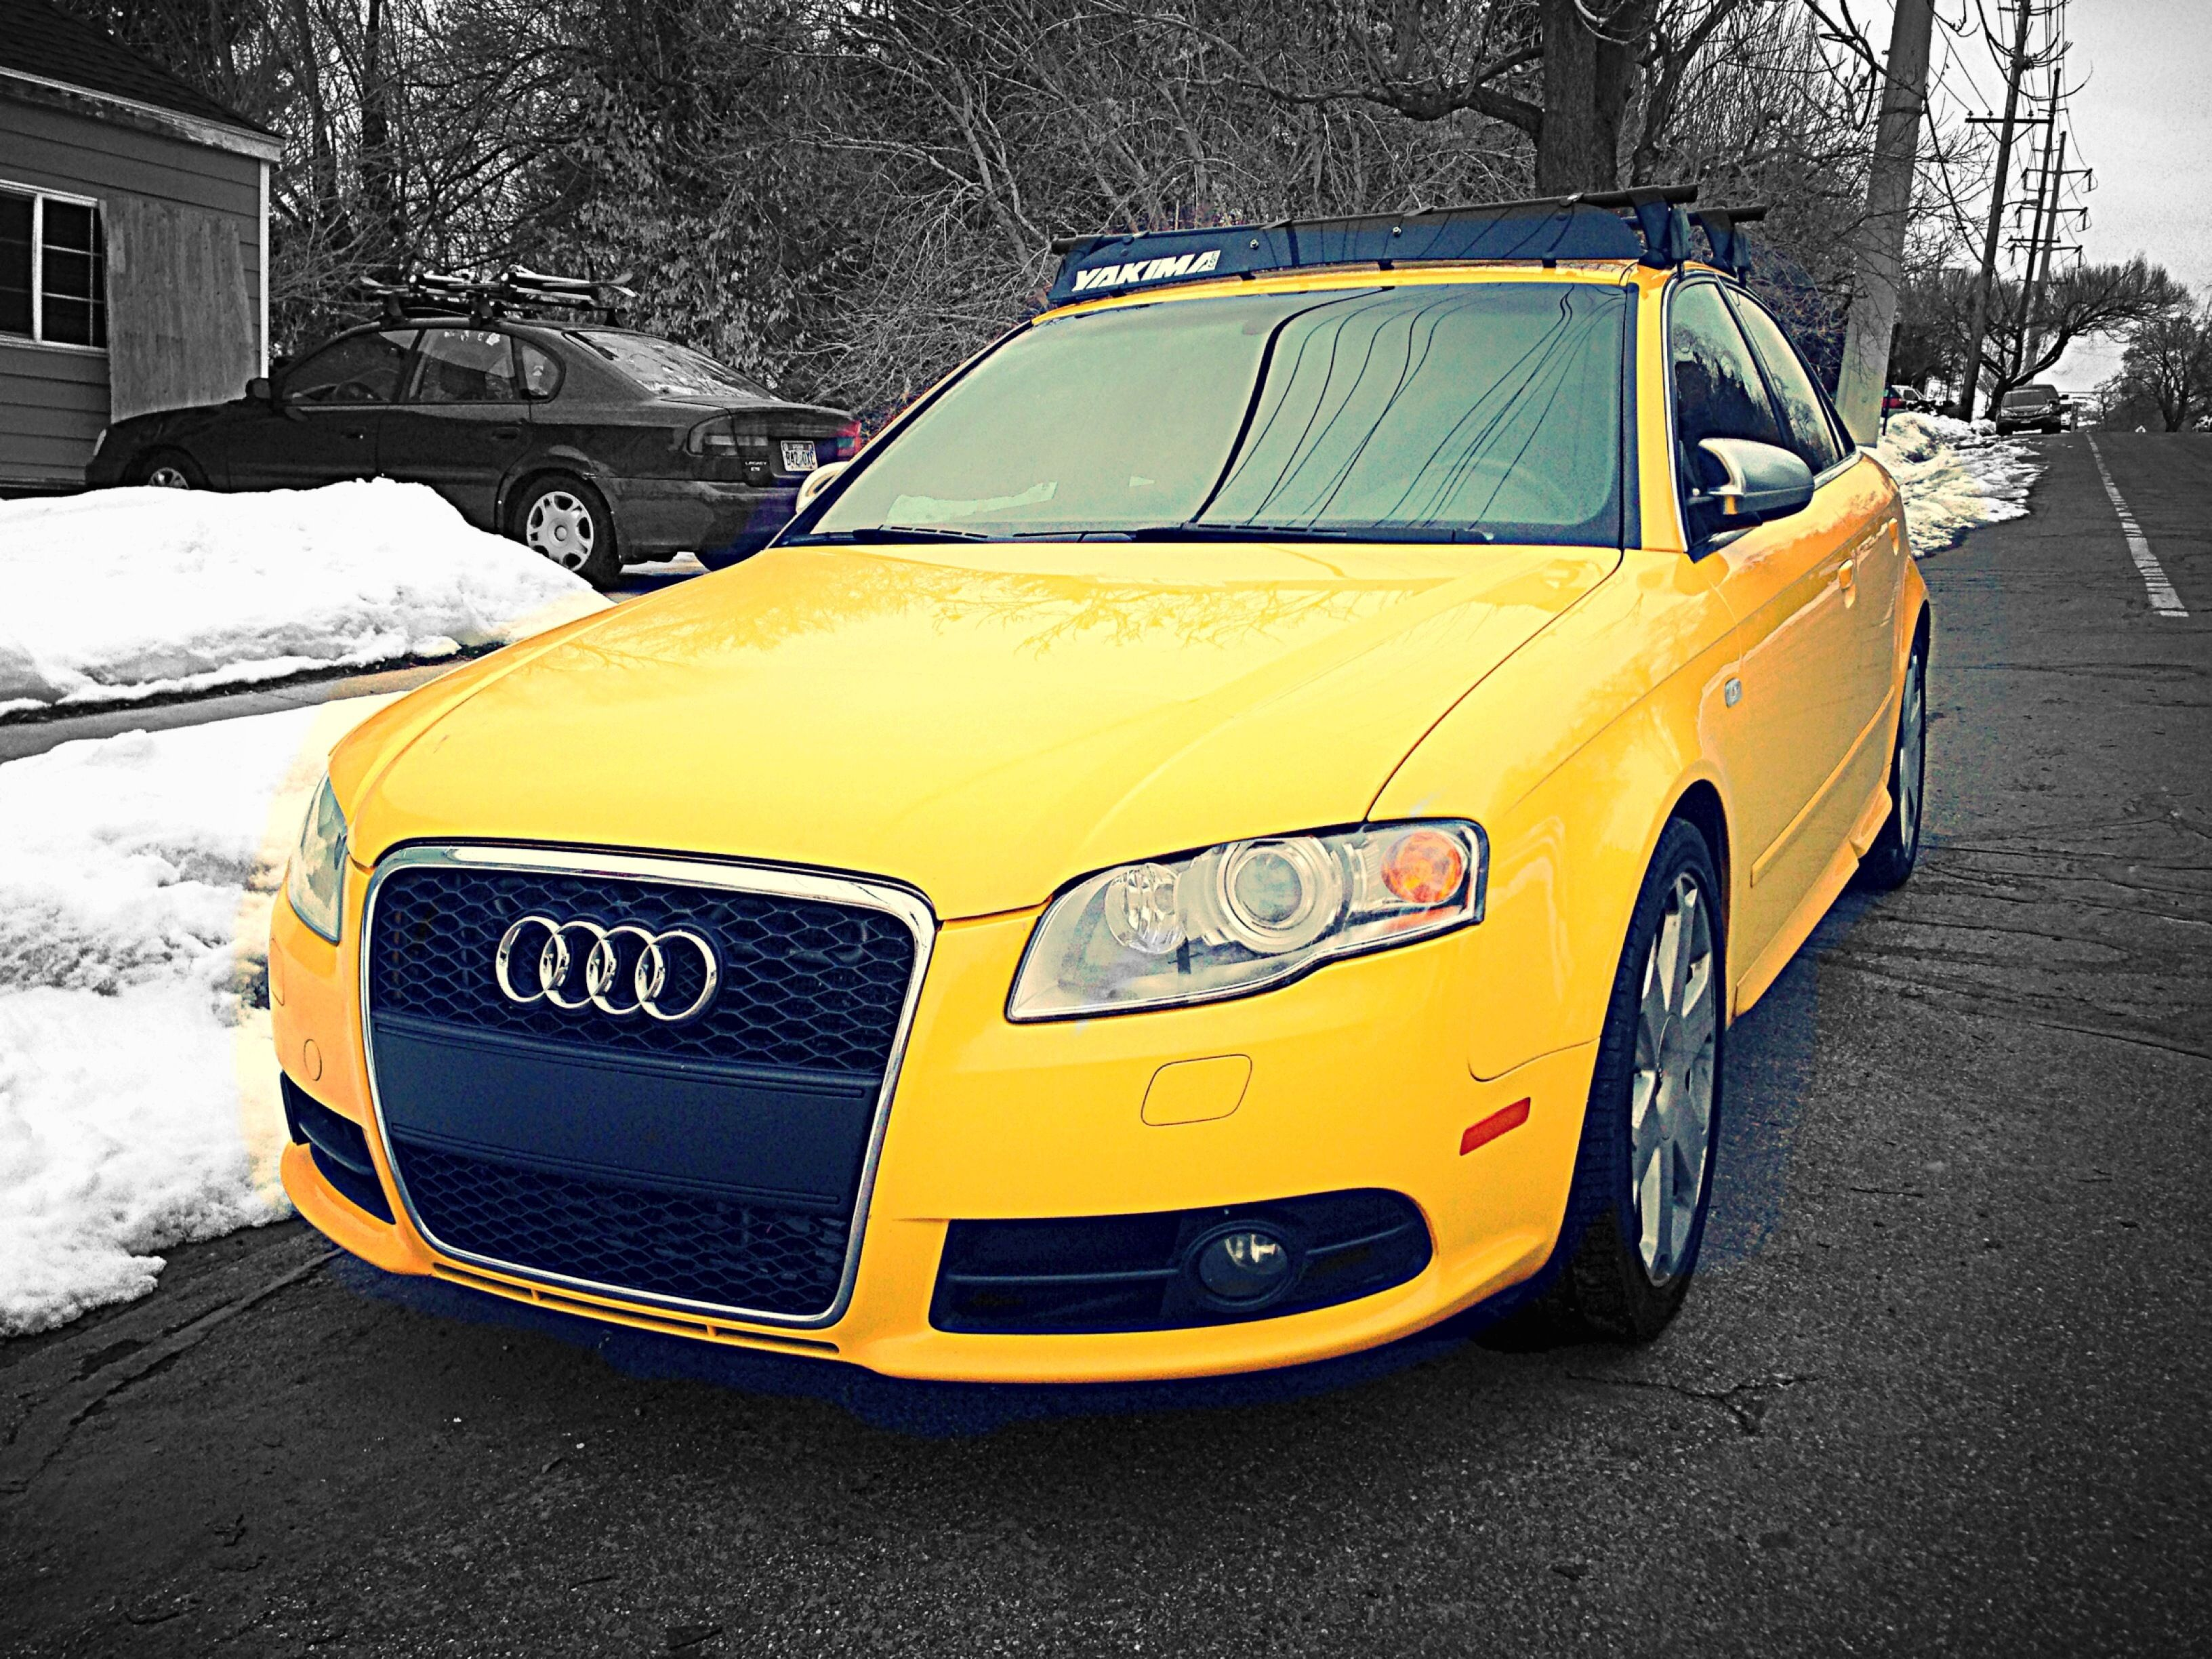 My New B7 2006 Audi S4 W Rs4 Grill And Yakima Board Rack Audi S4 Audi Volkswagen